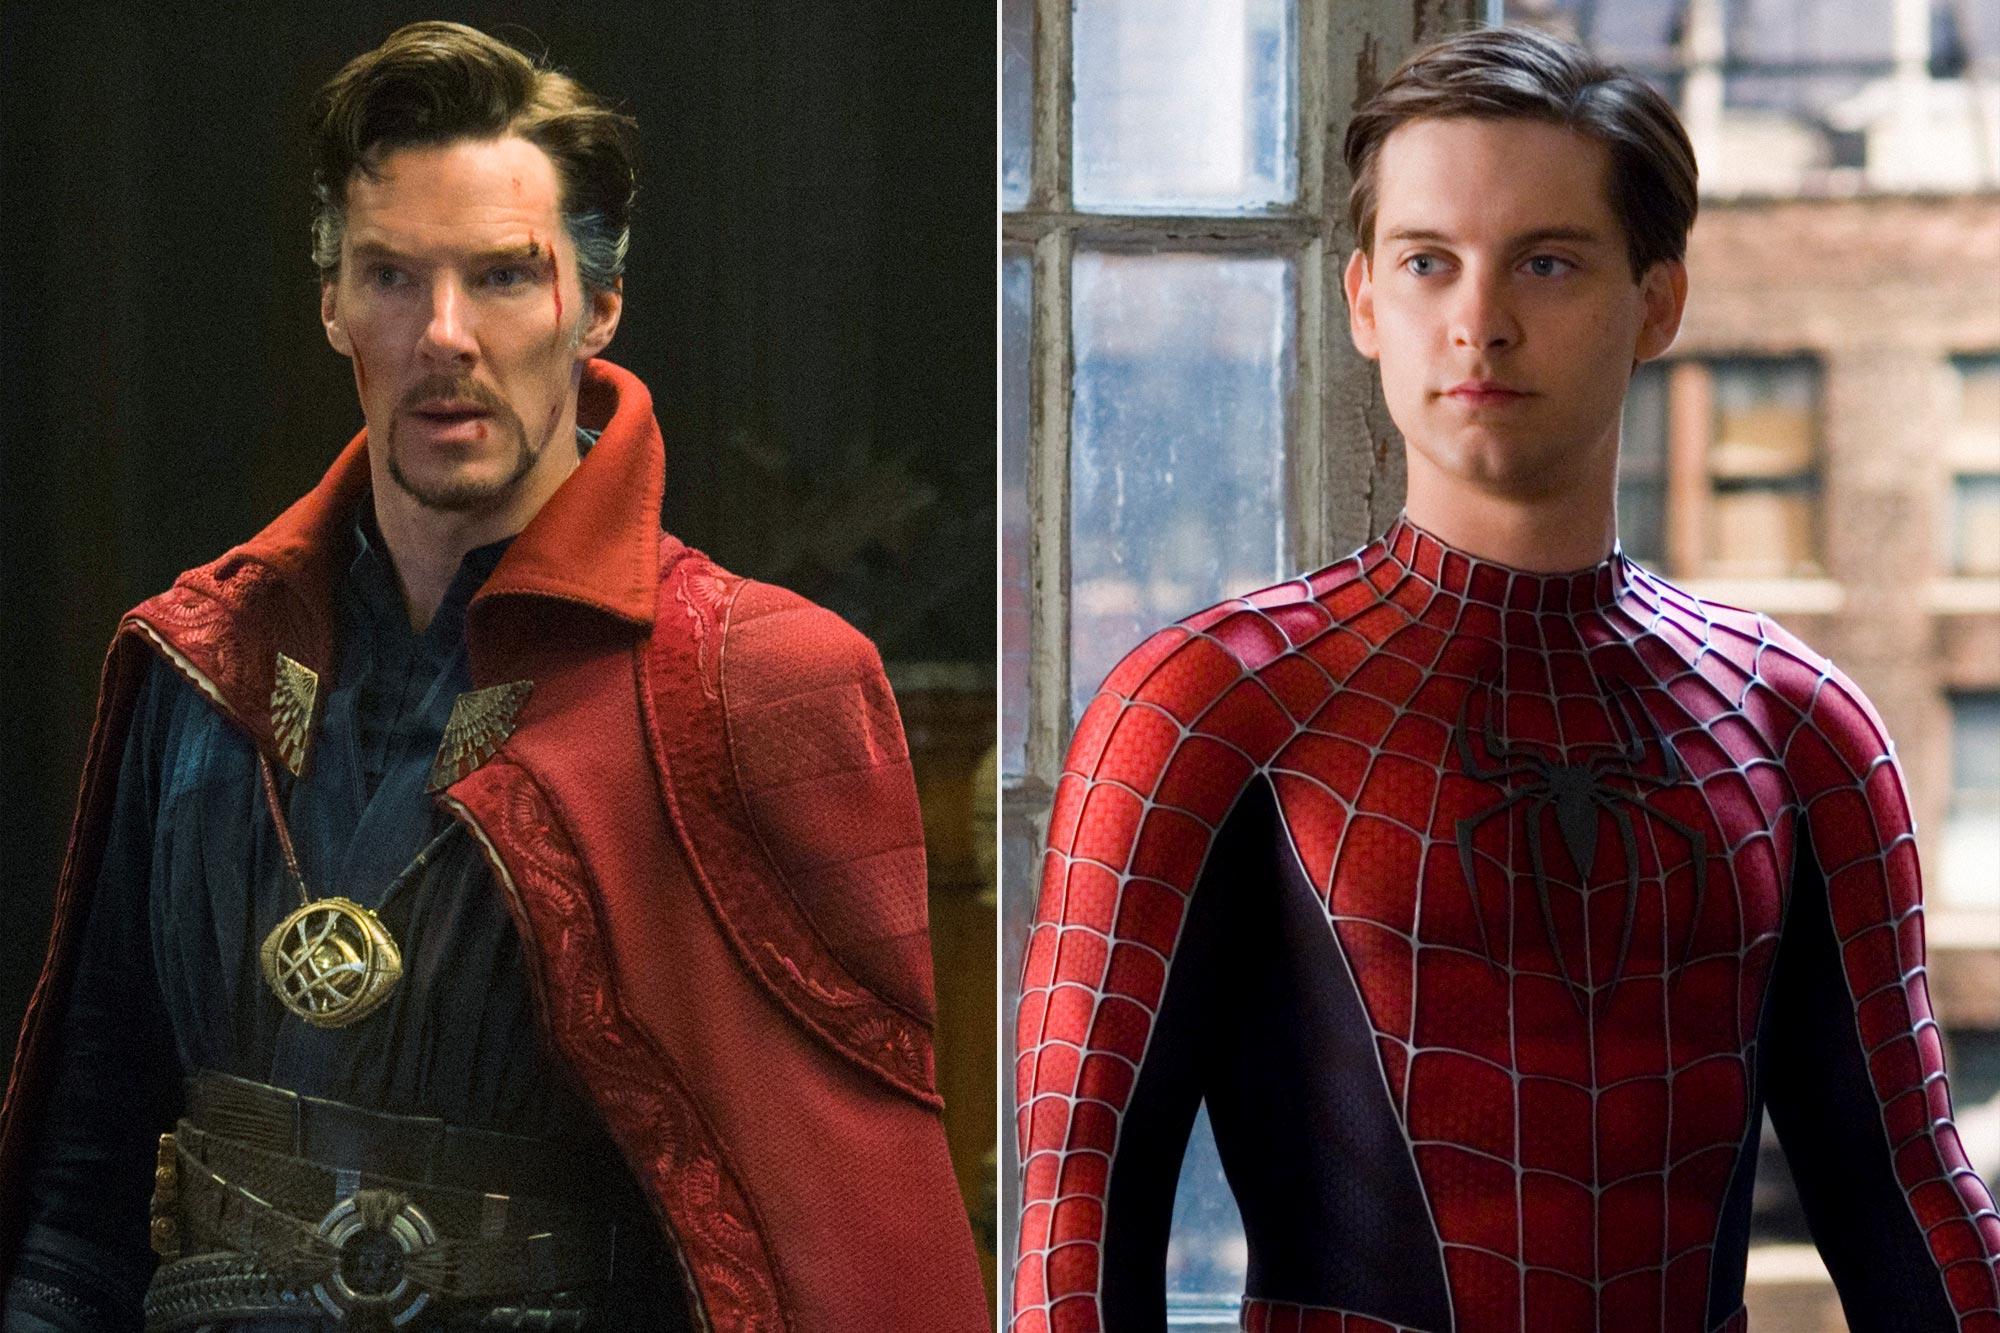 DOCTOR STRANGE; Spider-man 3